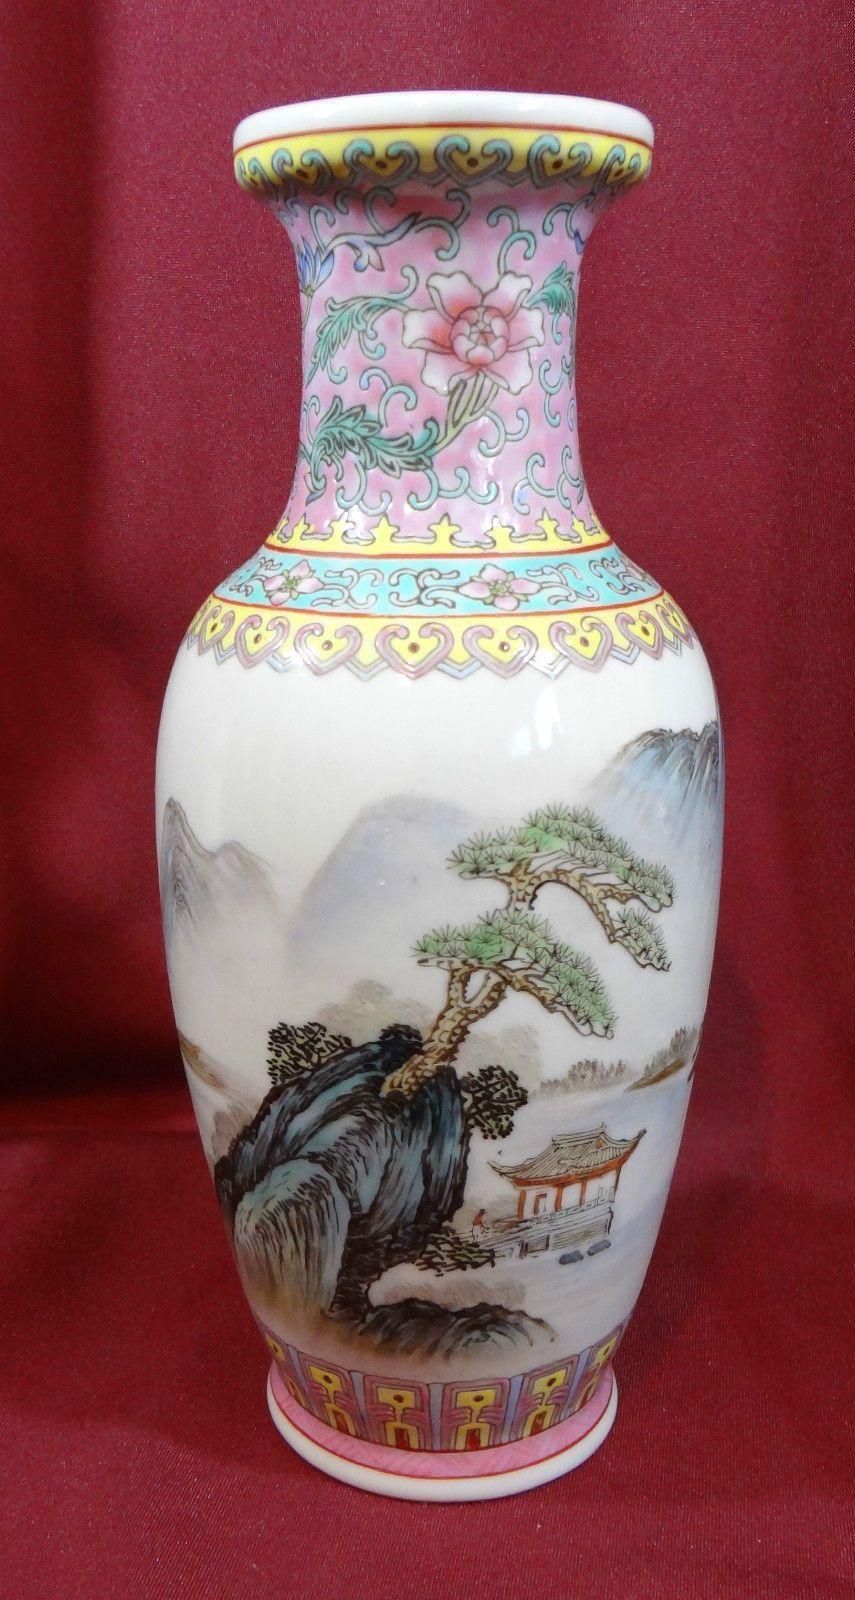 China Chinese Vase Porcelain Landscape 10 Inch Tall Paper Vase